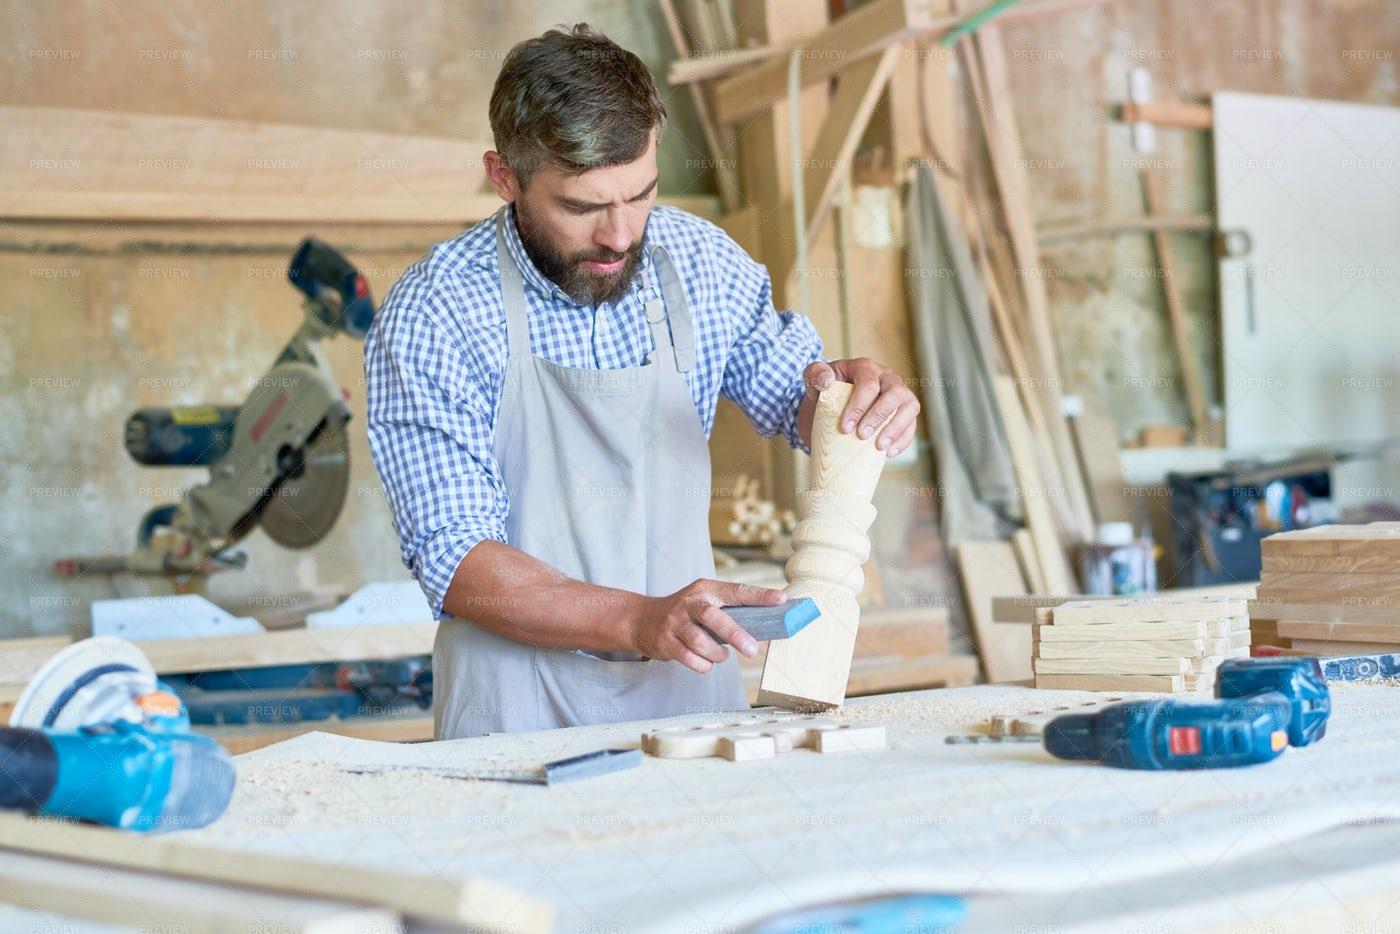 Bearded Carpenter Sanding Stair...: Stock Photos